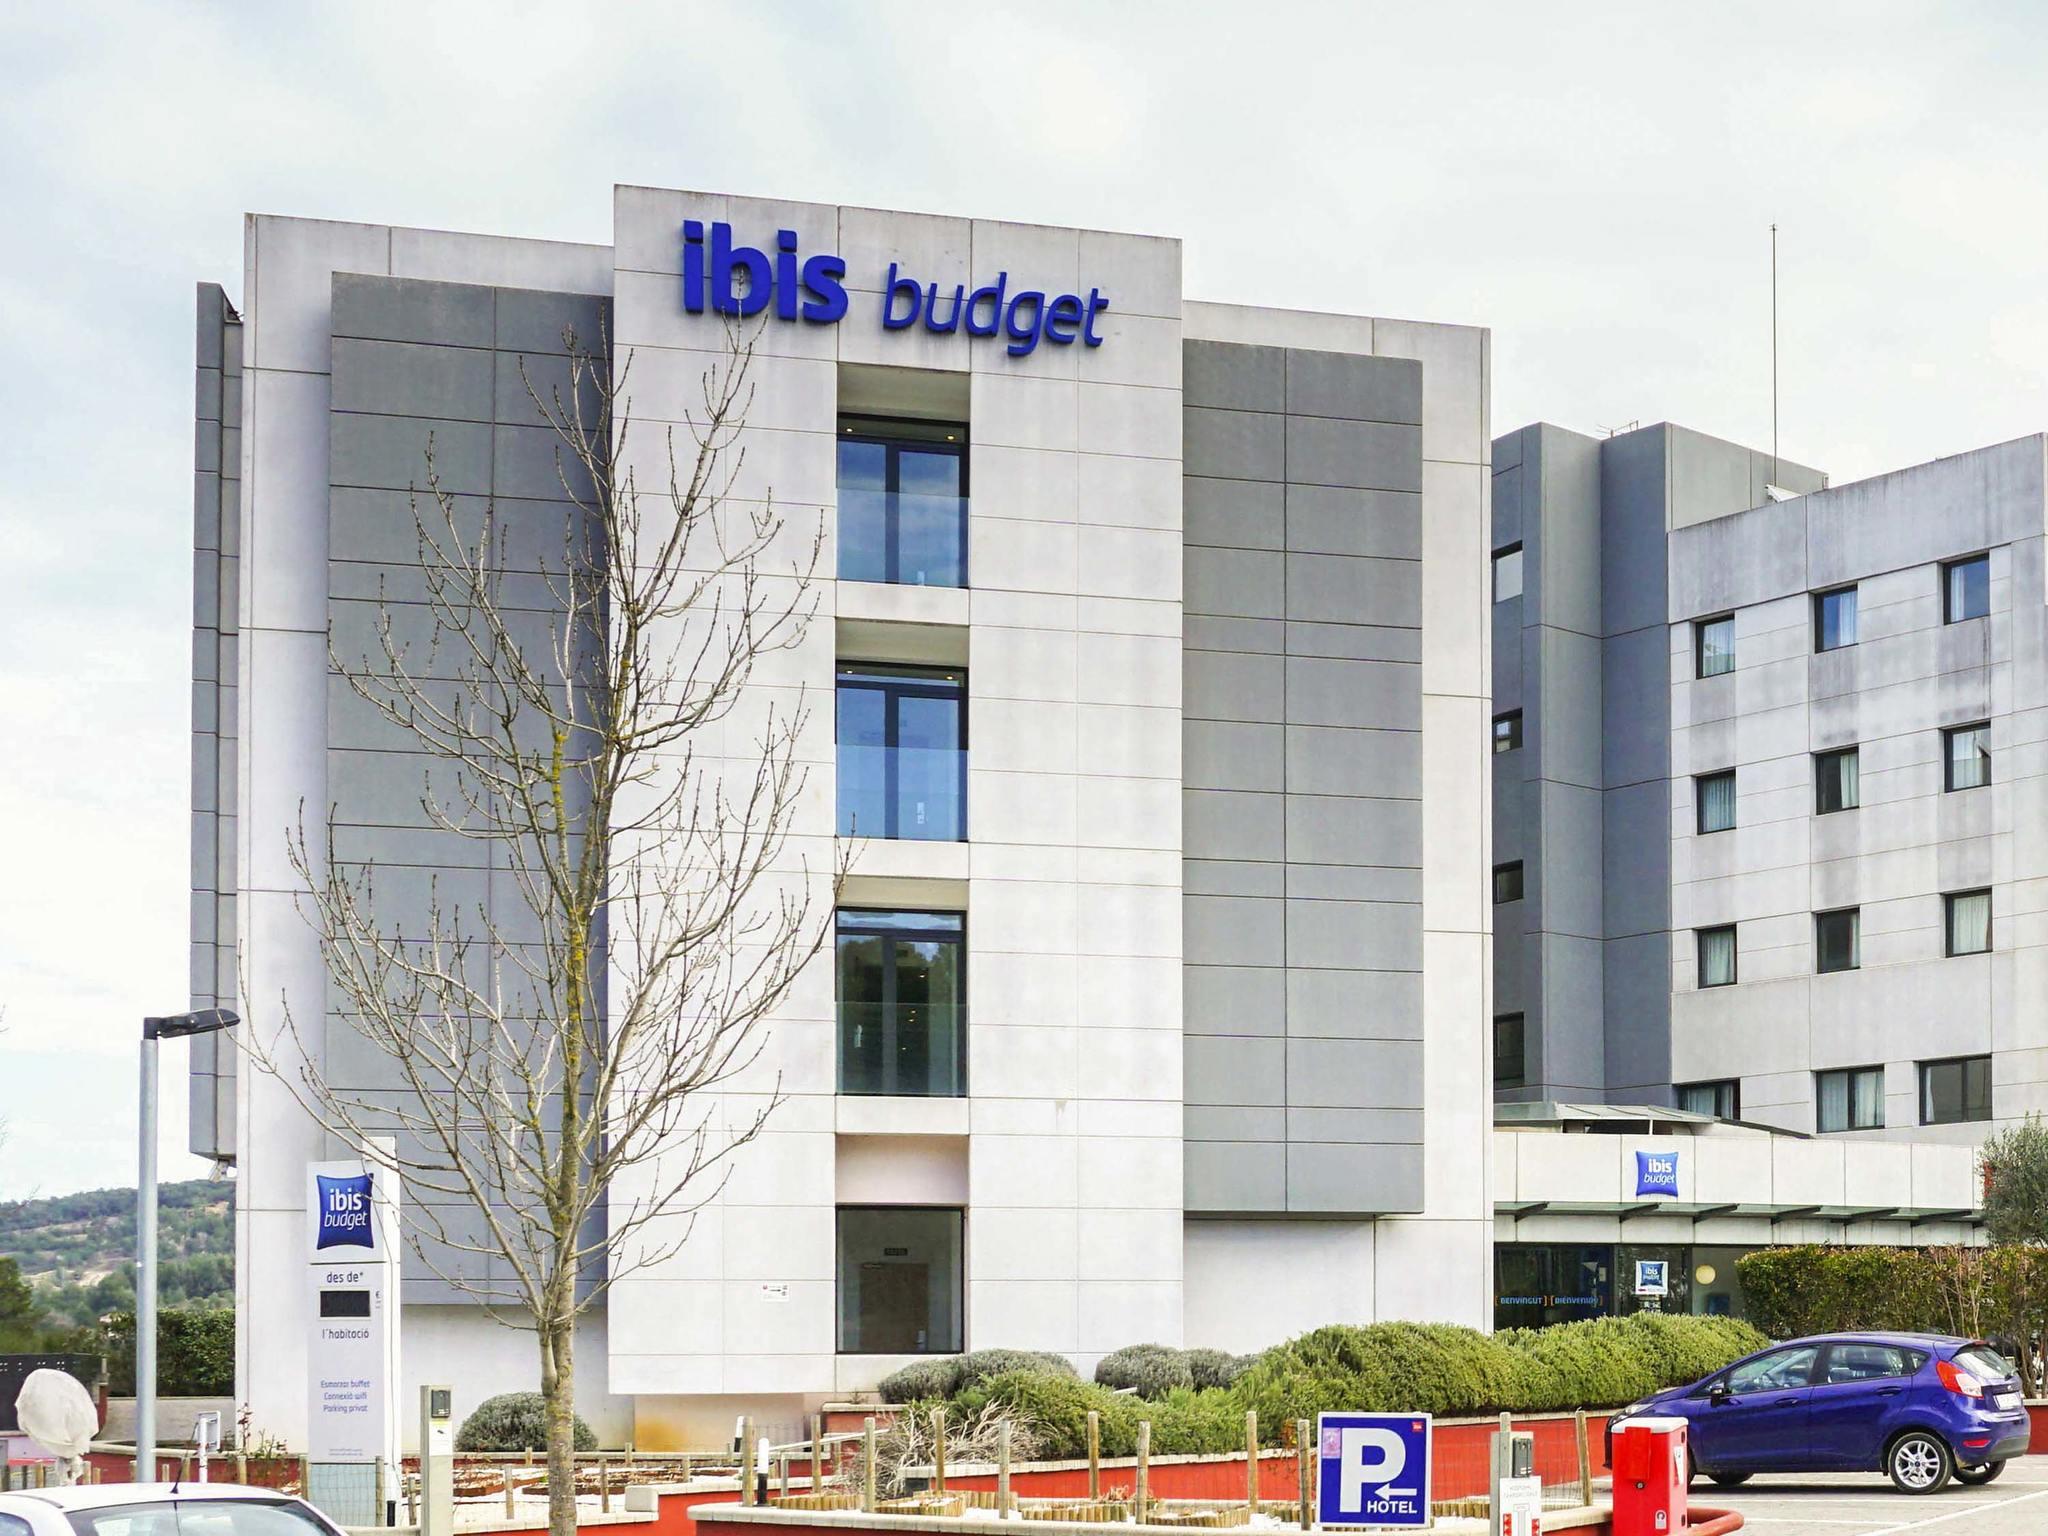 Alojamiento – ibis budget Girona Costa Brava